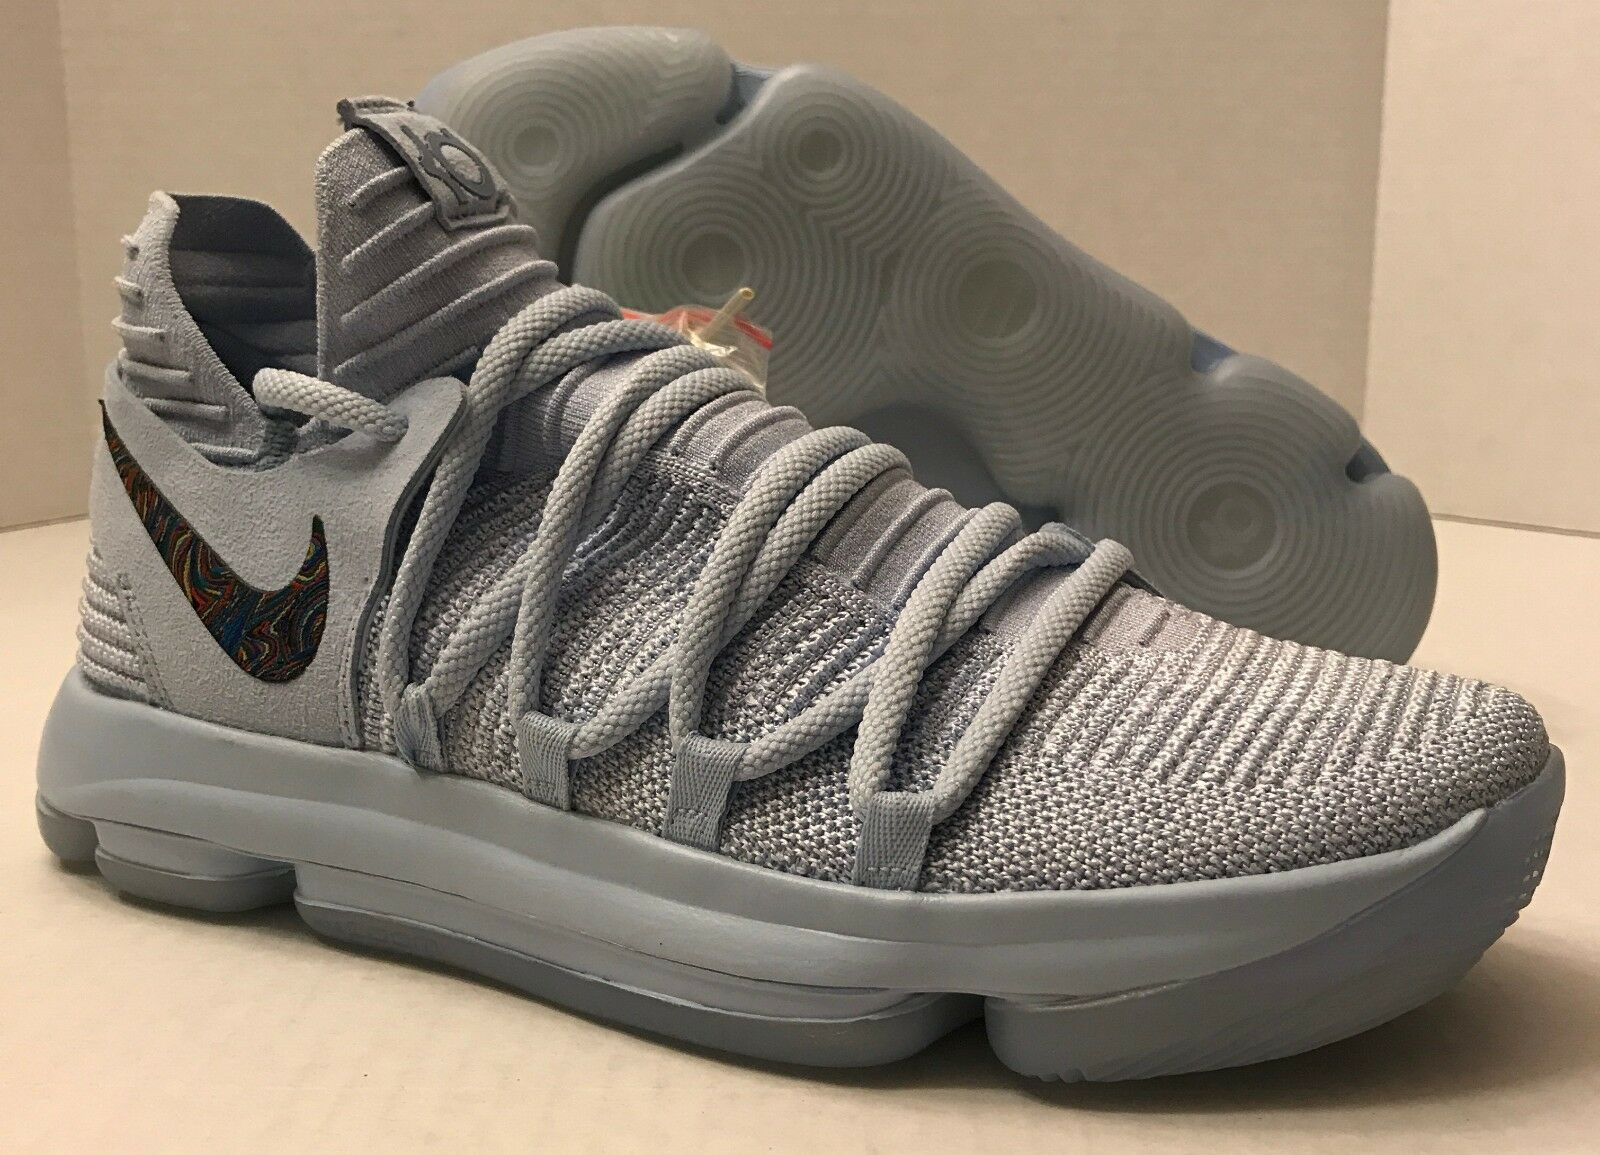 Nike x Zoom Kevin Durant KD x Nike 10 LMTD limitada